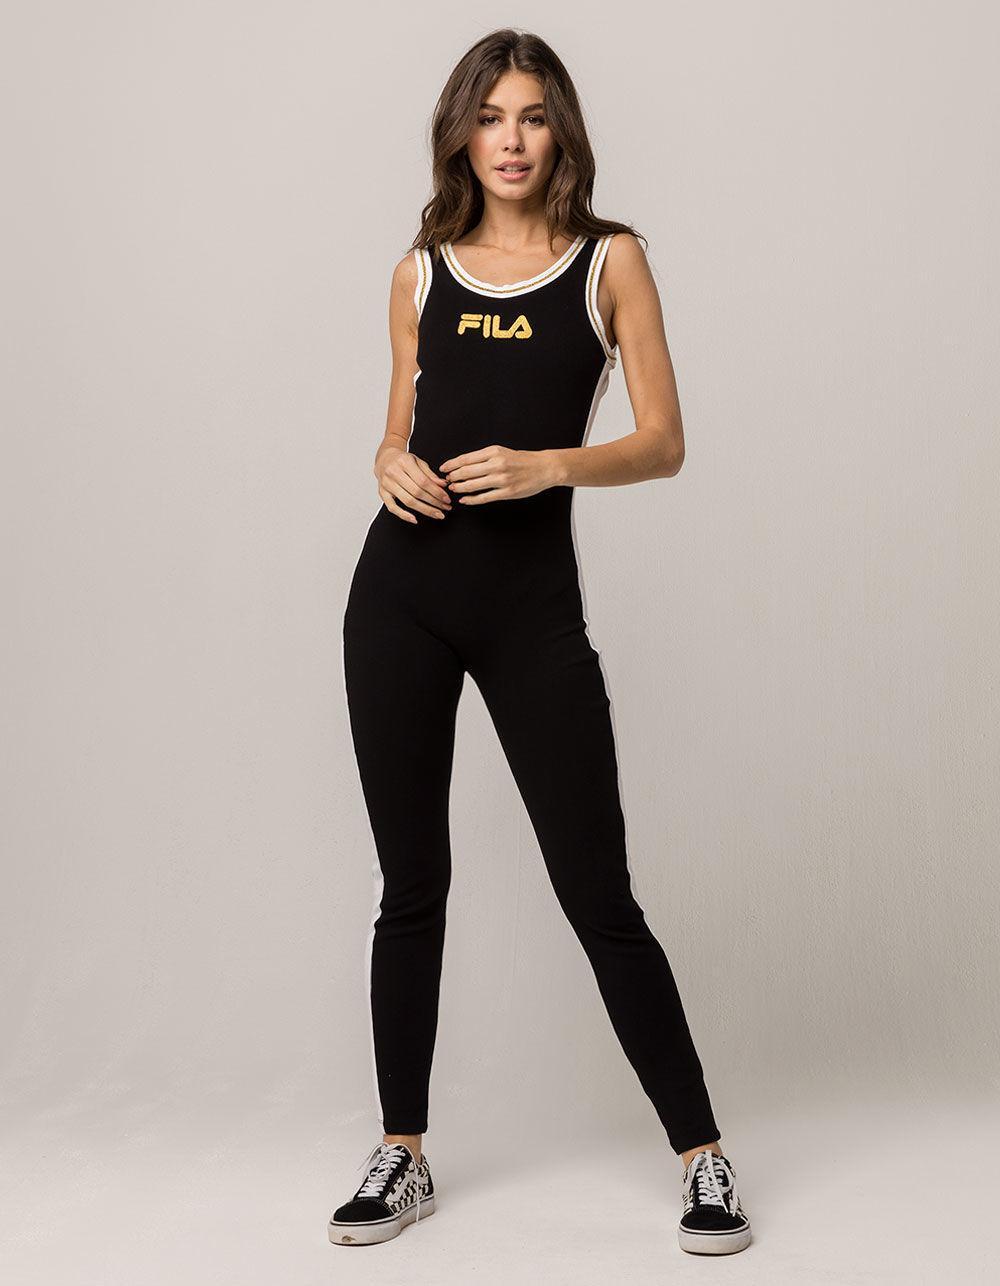 053ecf45959 Lyst - Fila Ivory Unitard Womens Jumpsuit in Black